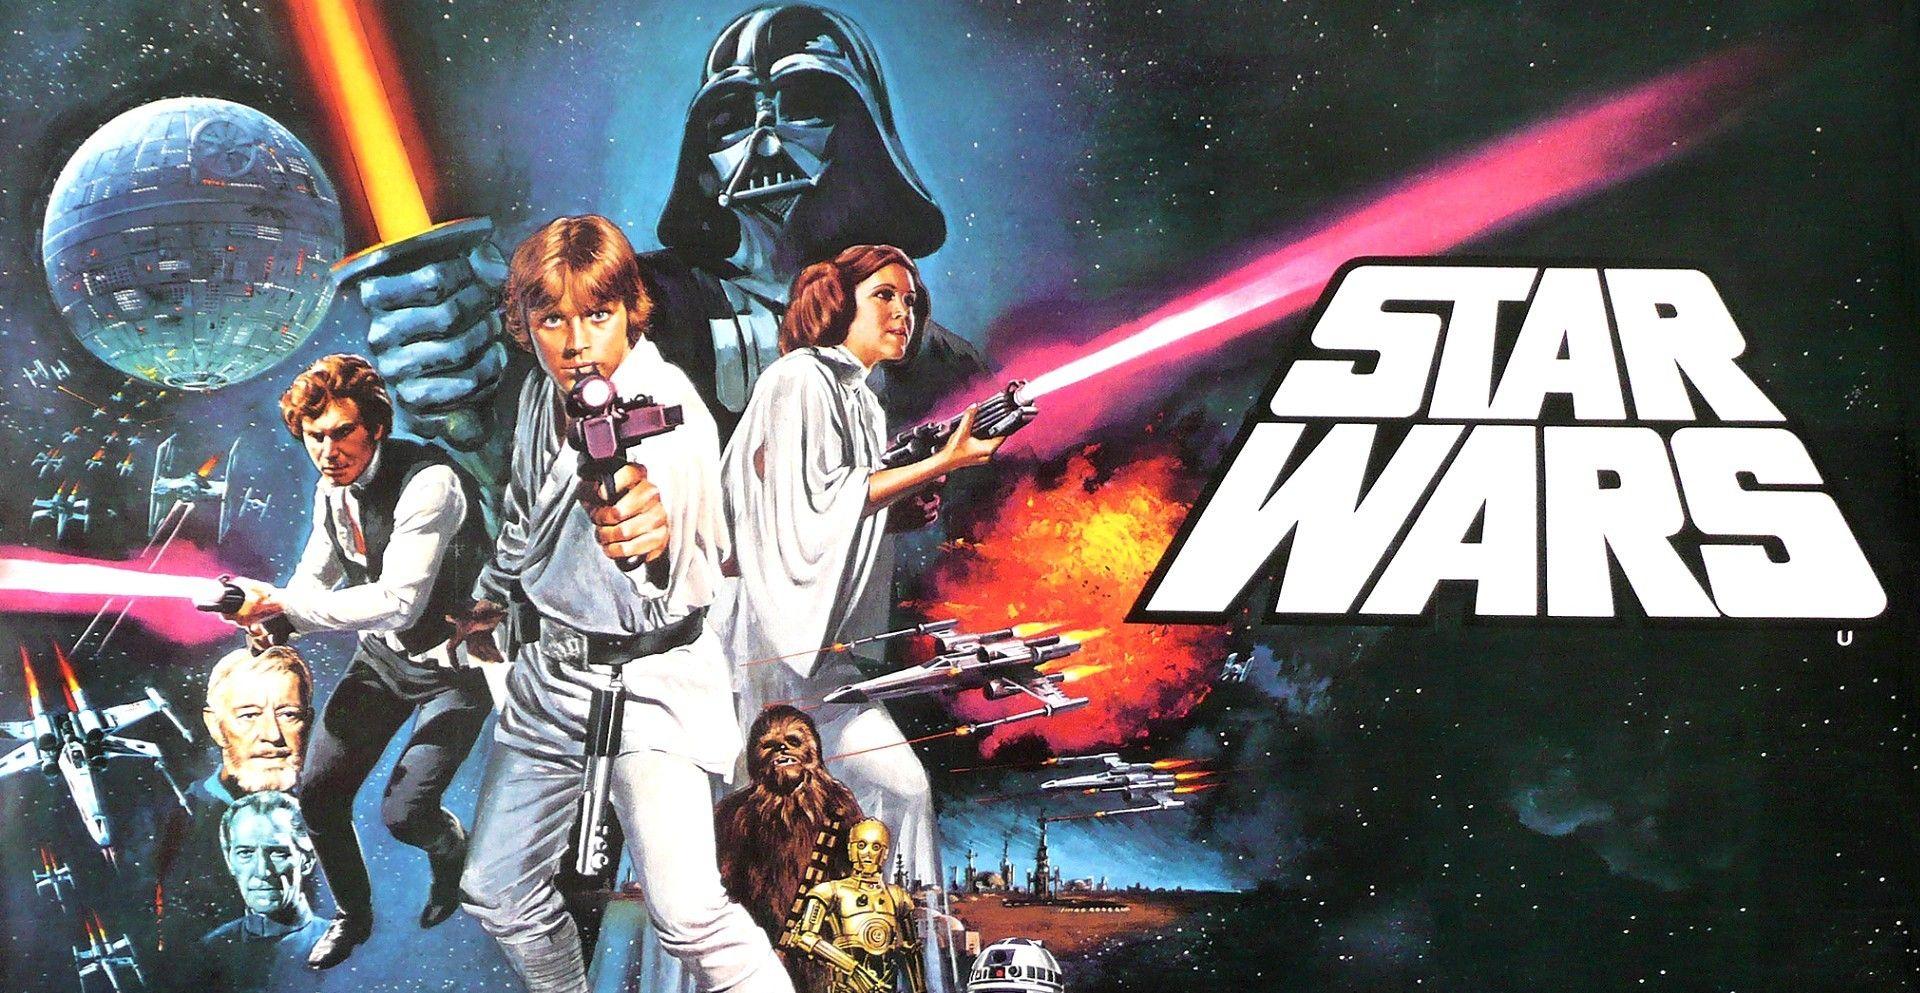 Star Wars: Episode VII Cast Announced